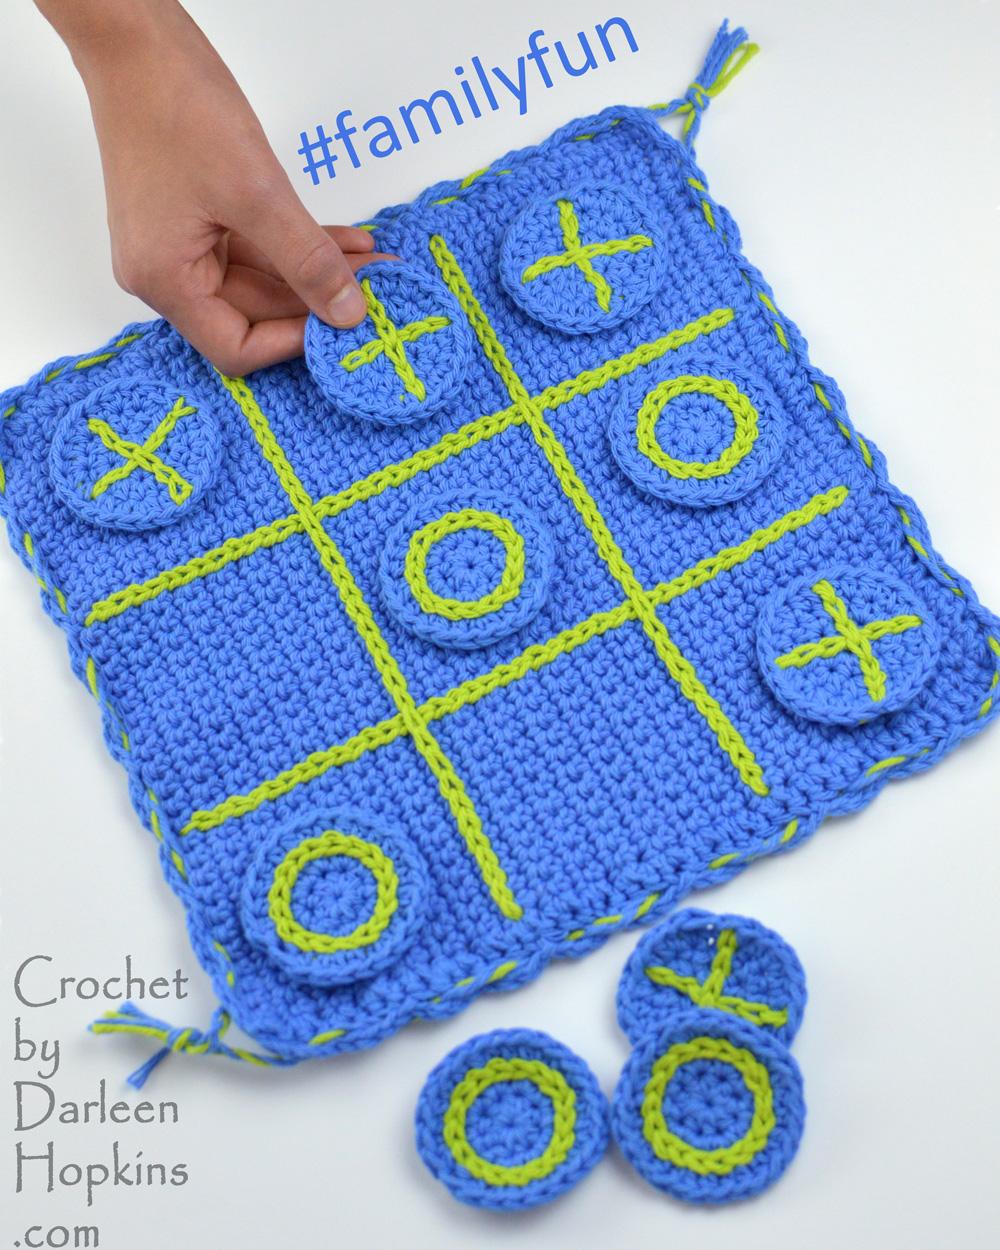 Game Family Fun Game Board Crochet By Darleen Hopkins